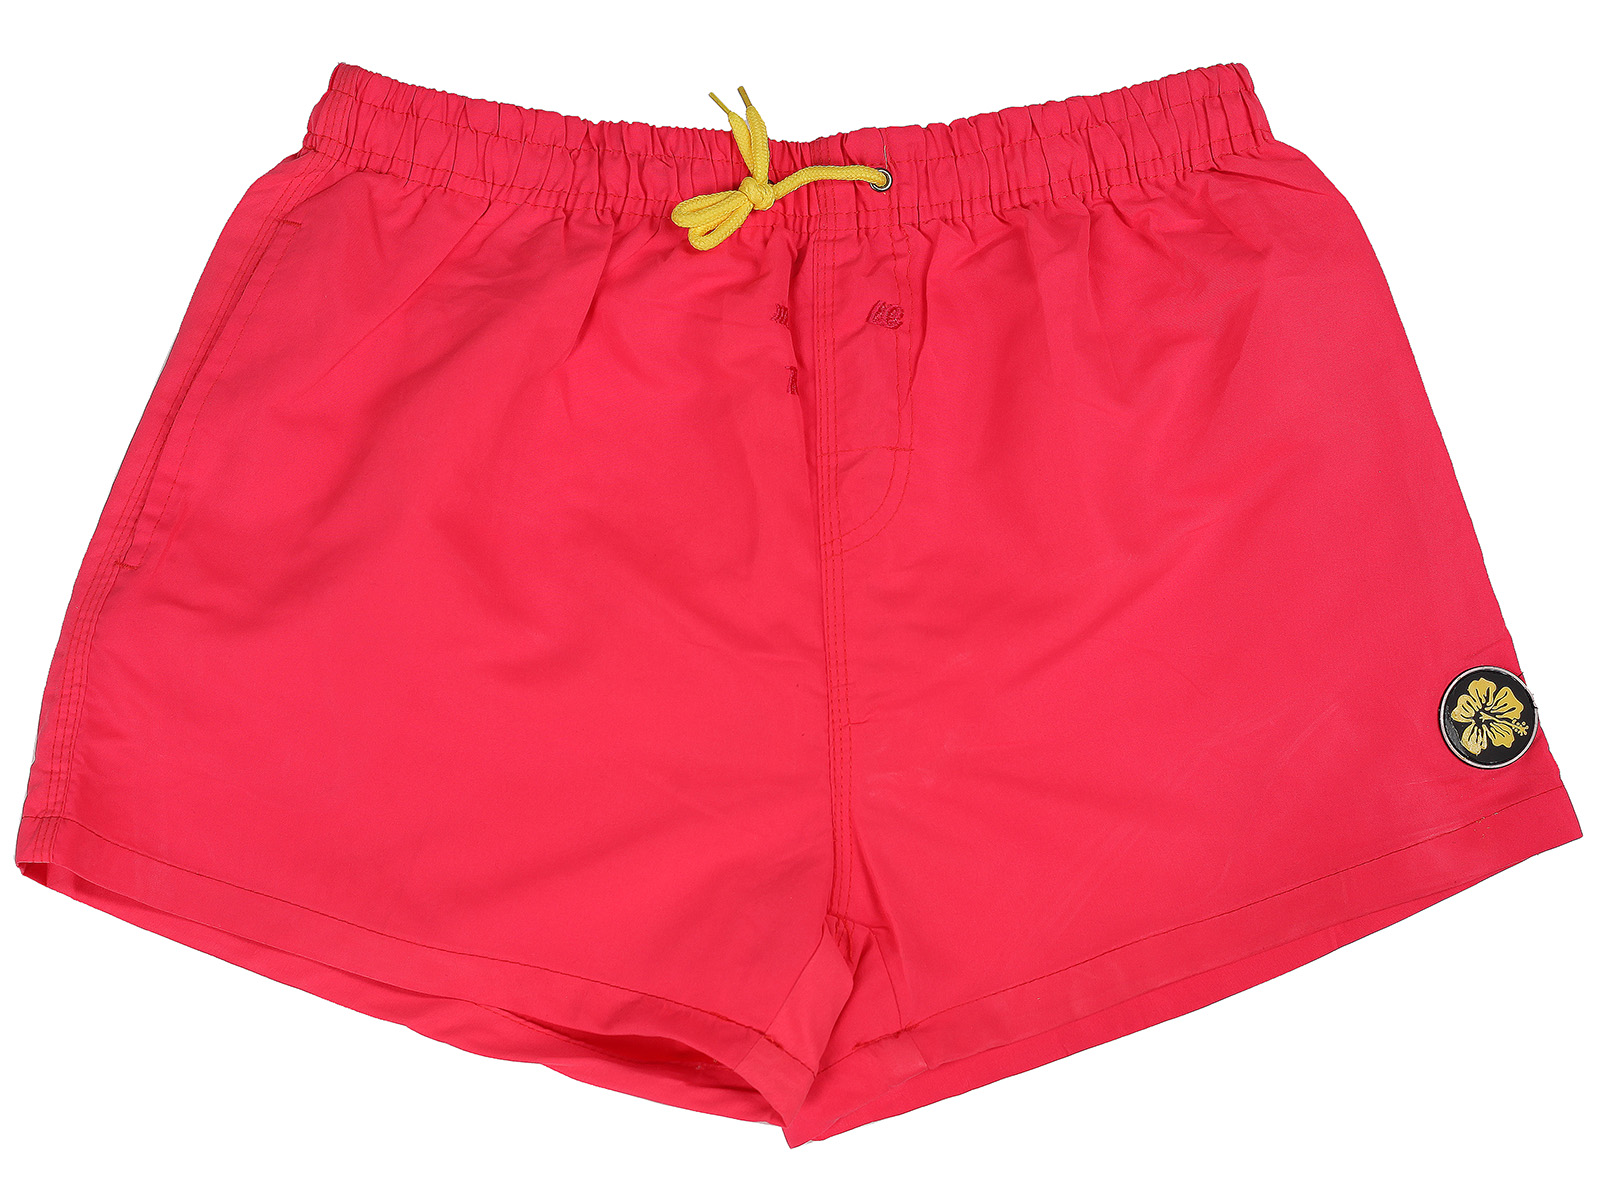 Яркие шорты для пляжа Okay